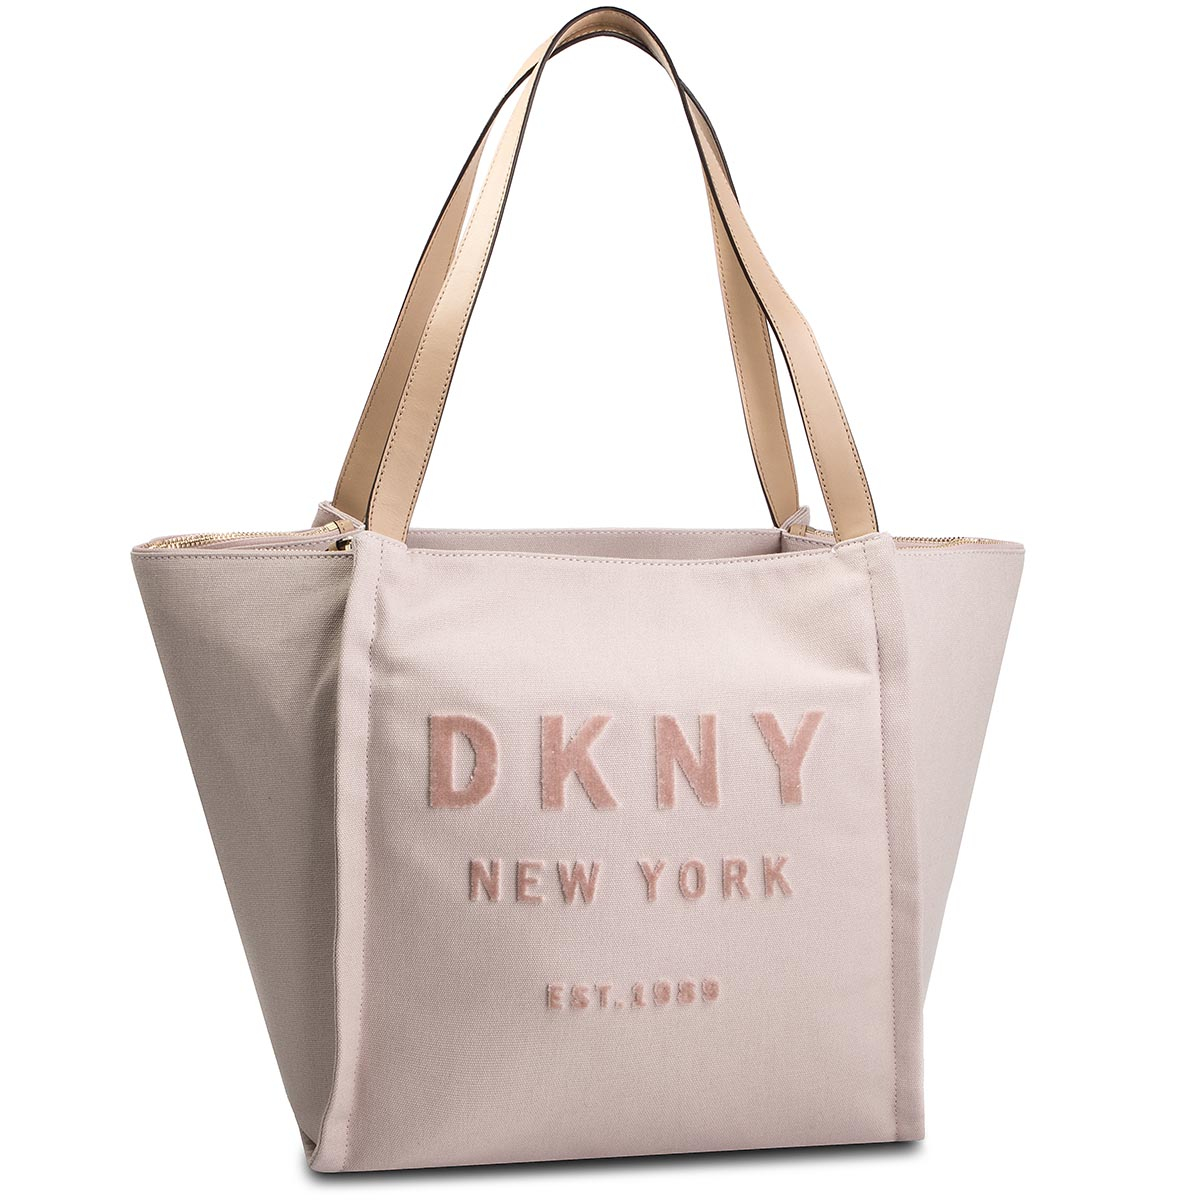 Kabelka DKNY Courtney Ew Tote Can R91AGB32 Iconic Blush 3IB